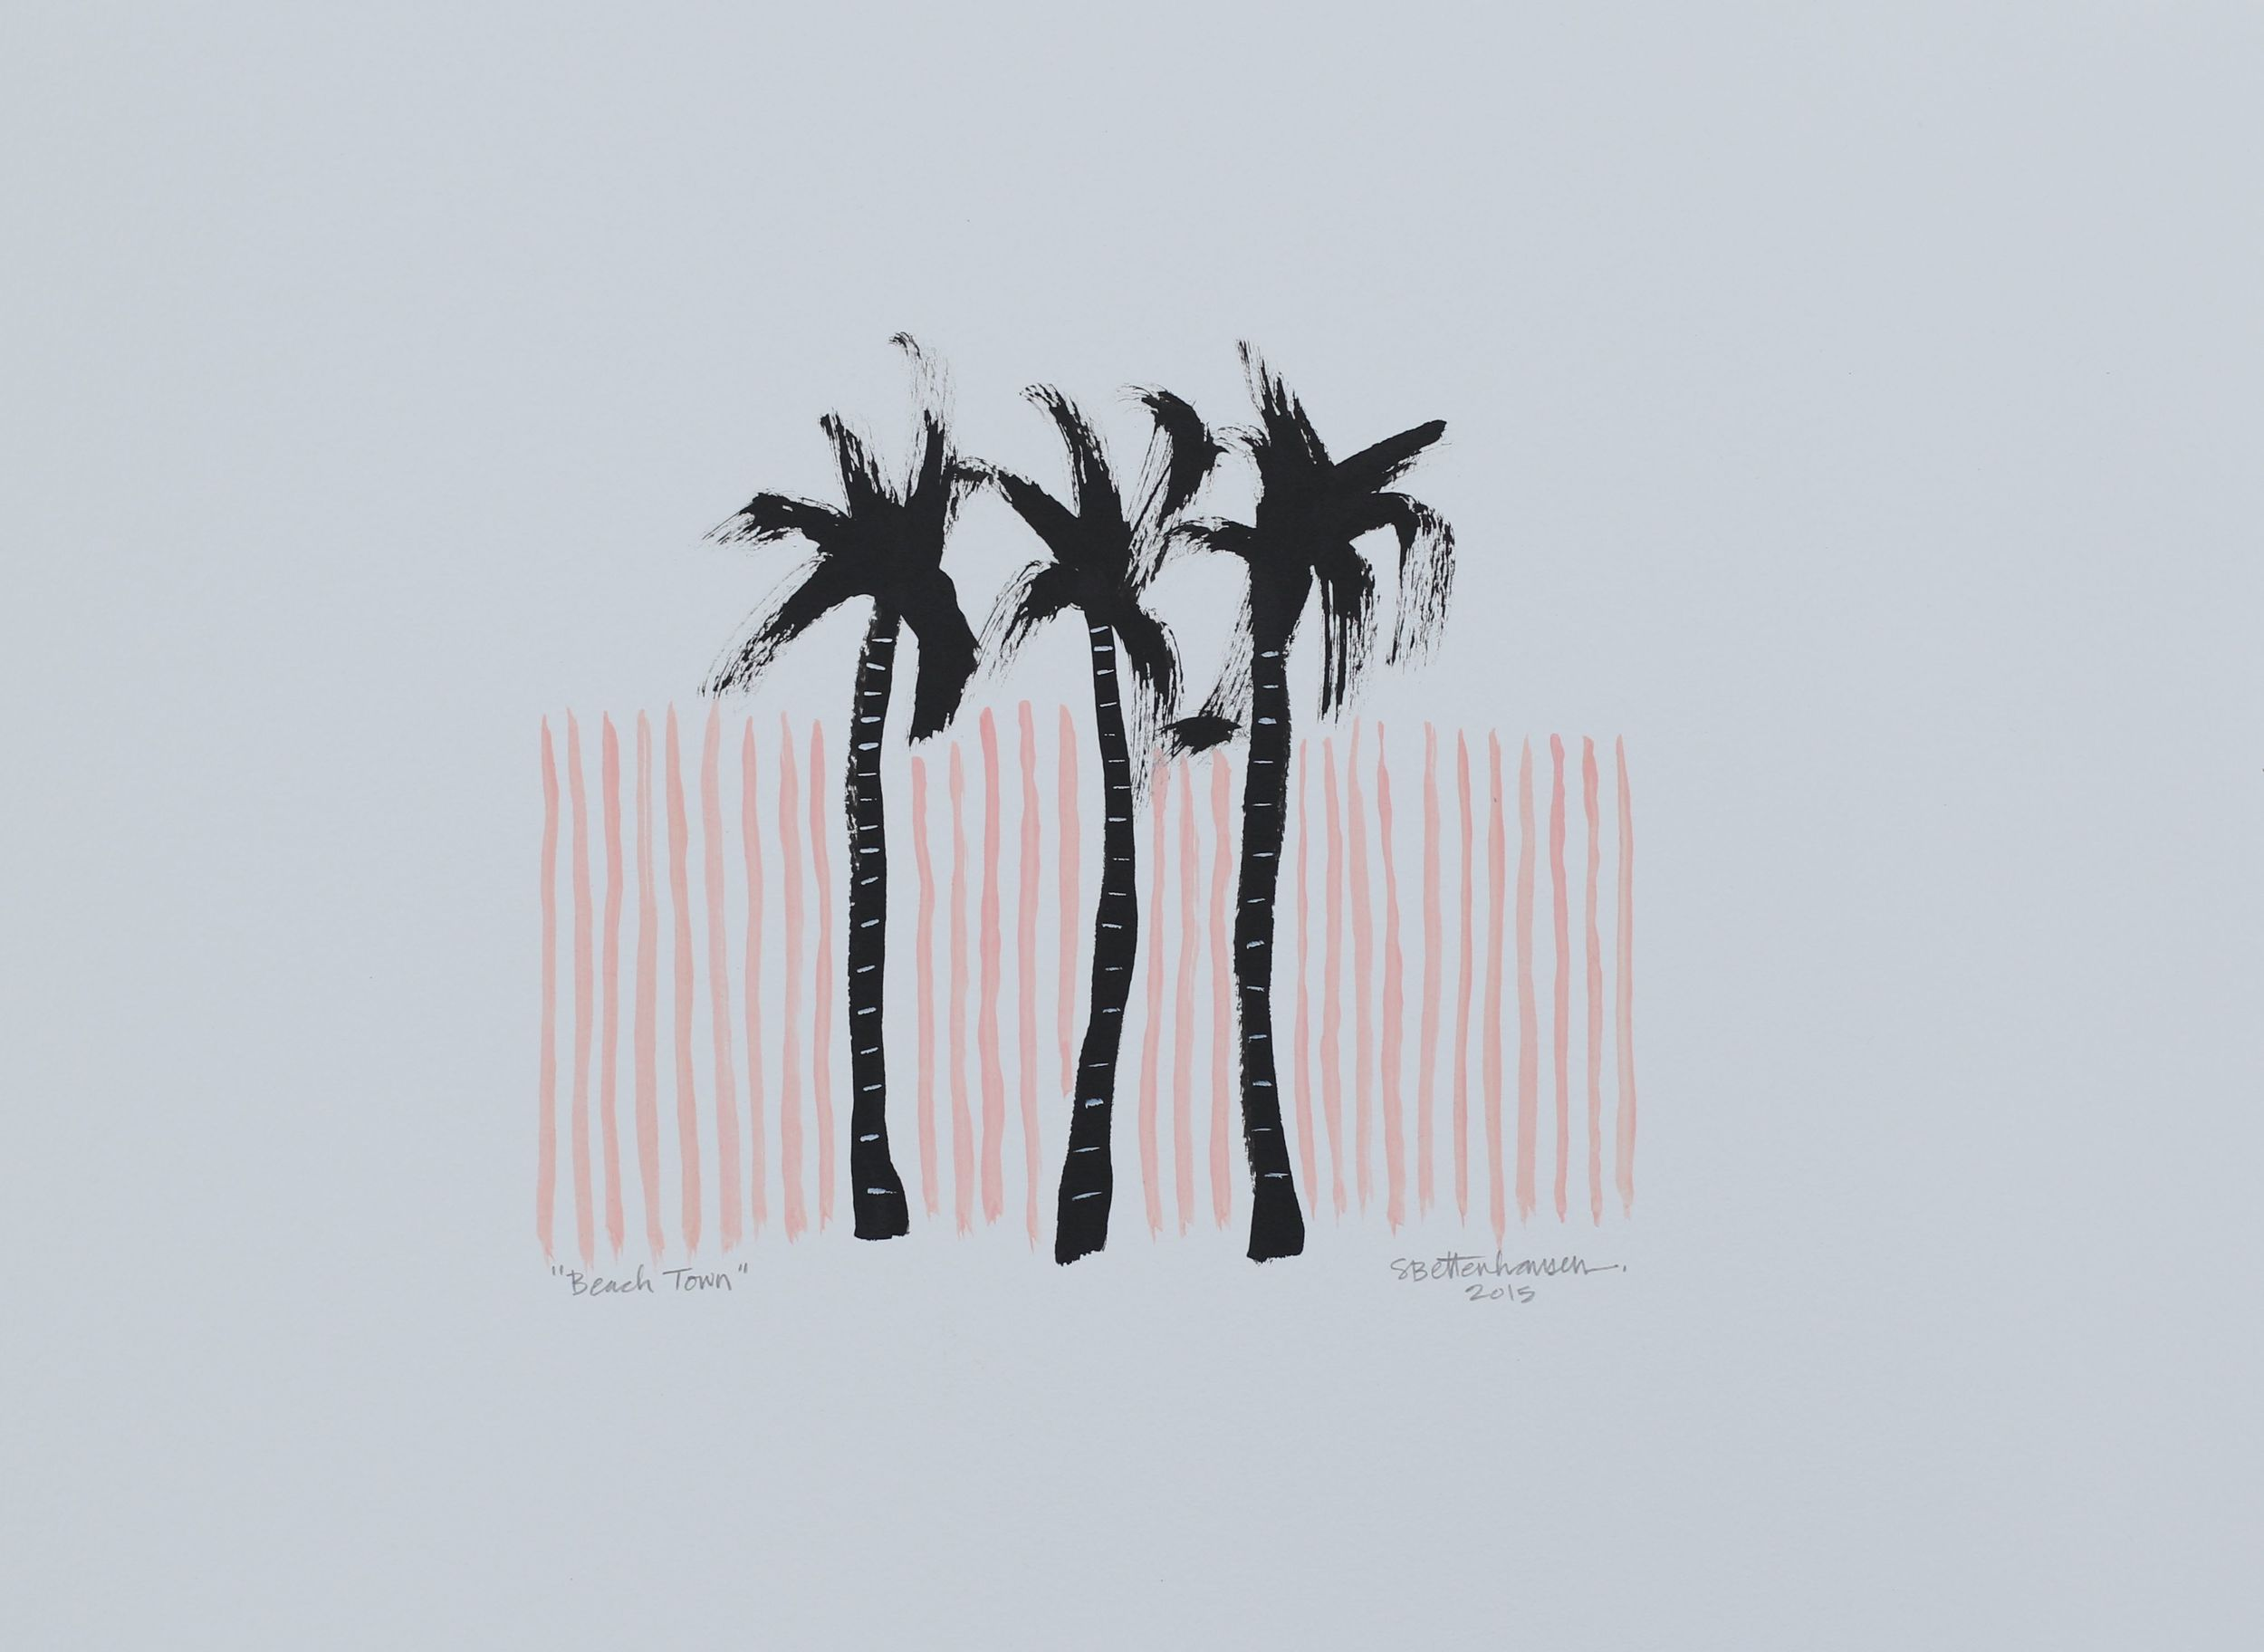 """Beach Town"" 11x15 on paper $125"